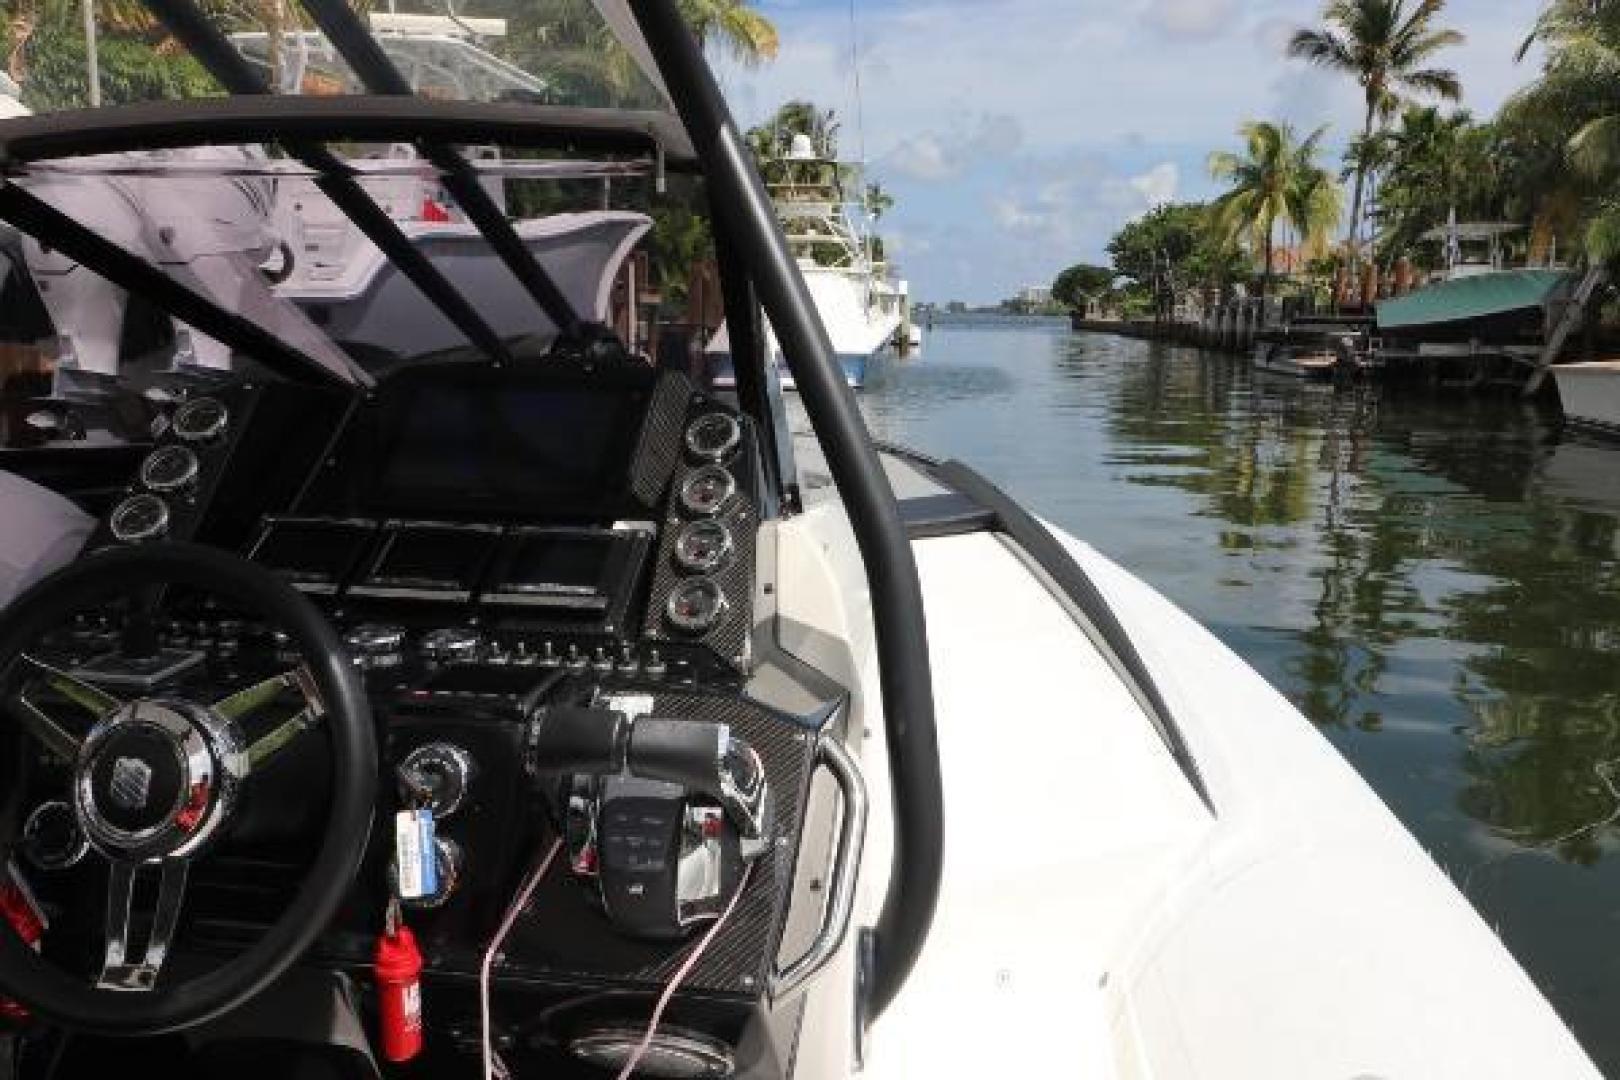 Sacs-Strider 40 ESSE R 2016-Sacs Strider 40 ESSE R Fort Lauderdale-Florida-United States-1533419   Thumbnail